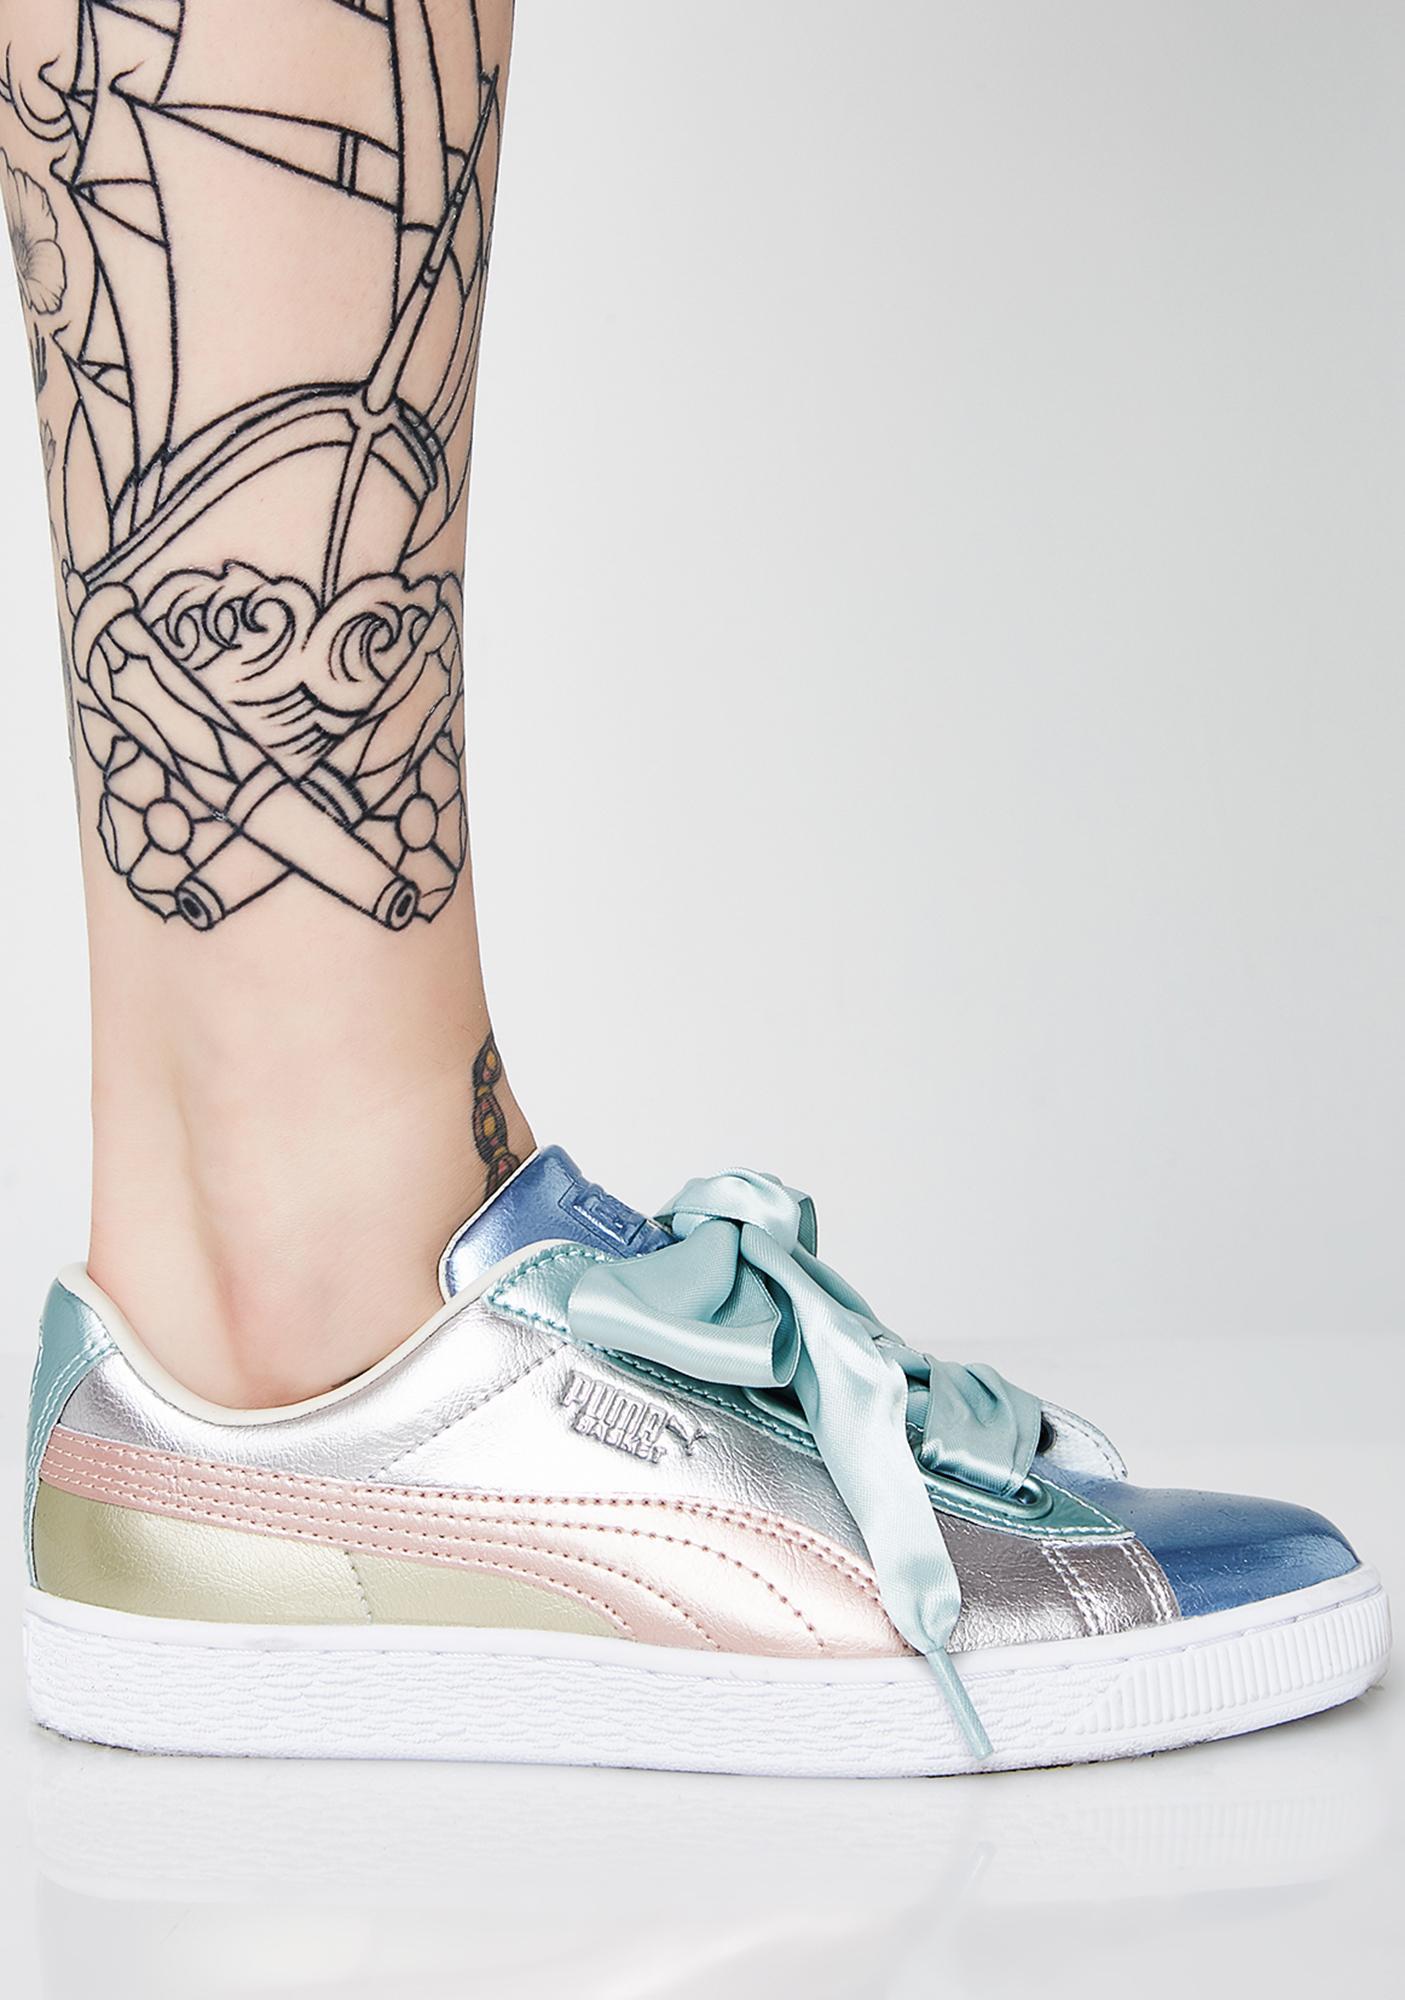 PUMA Basket Heart Bauble Sneakers